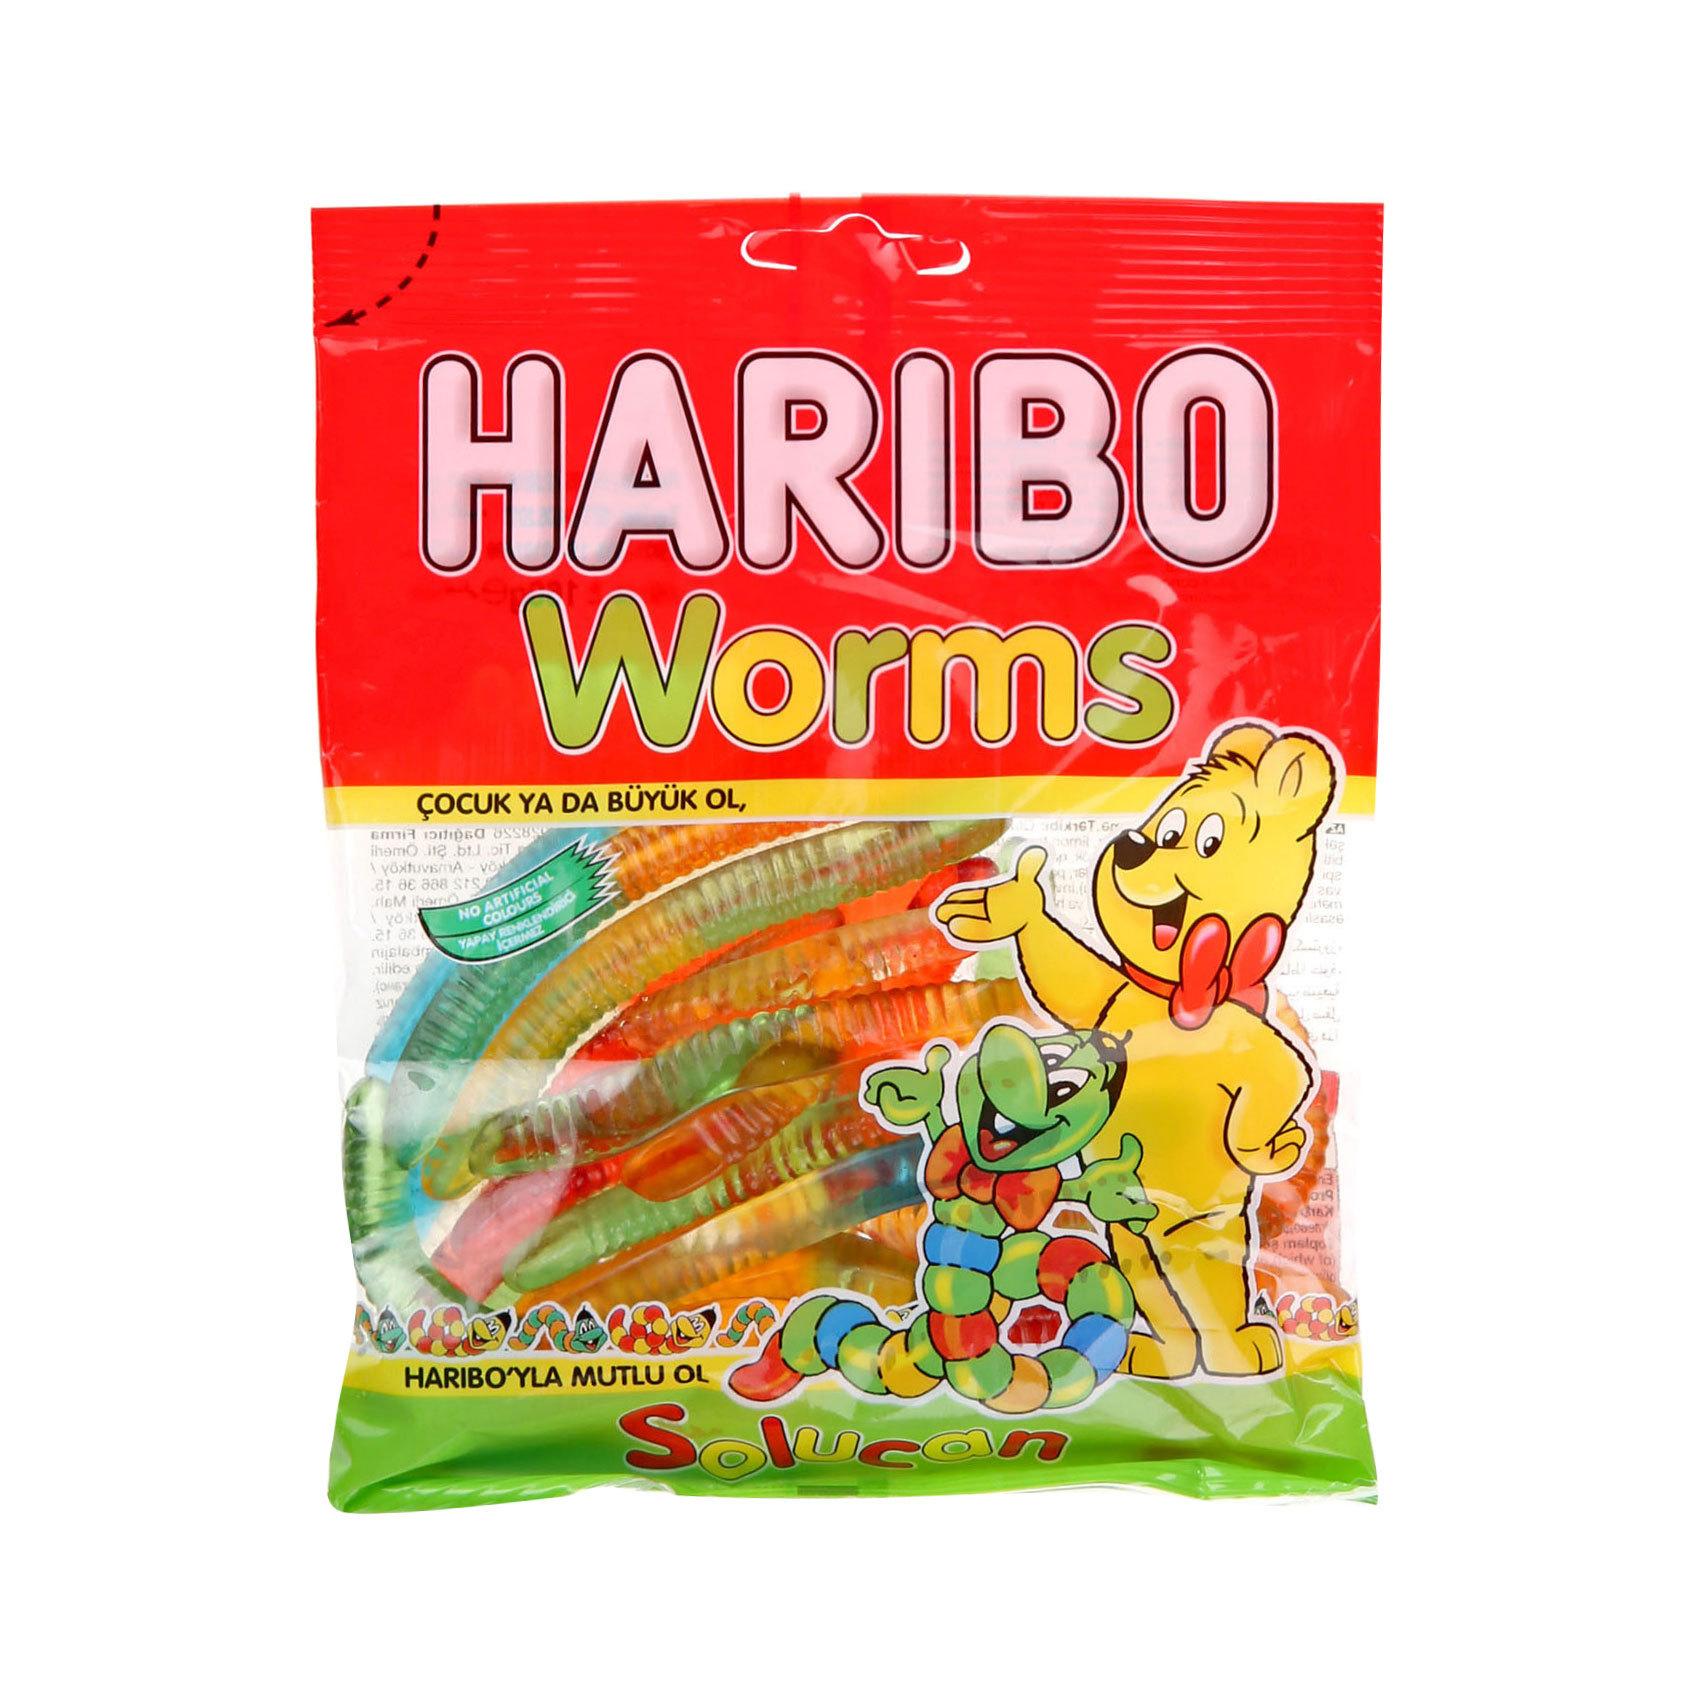 HARIBO WORMS 160G